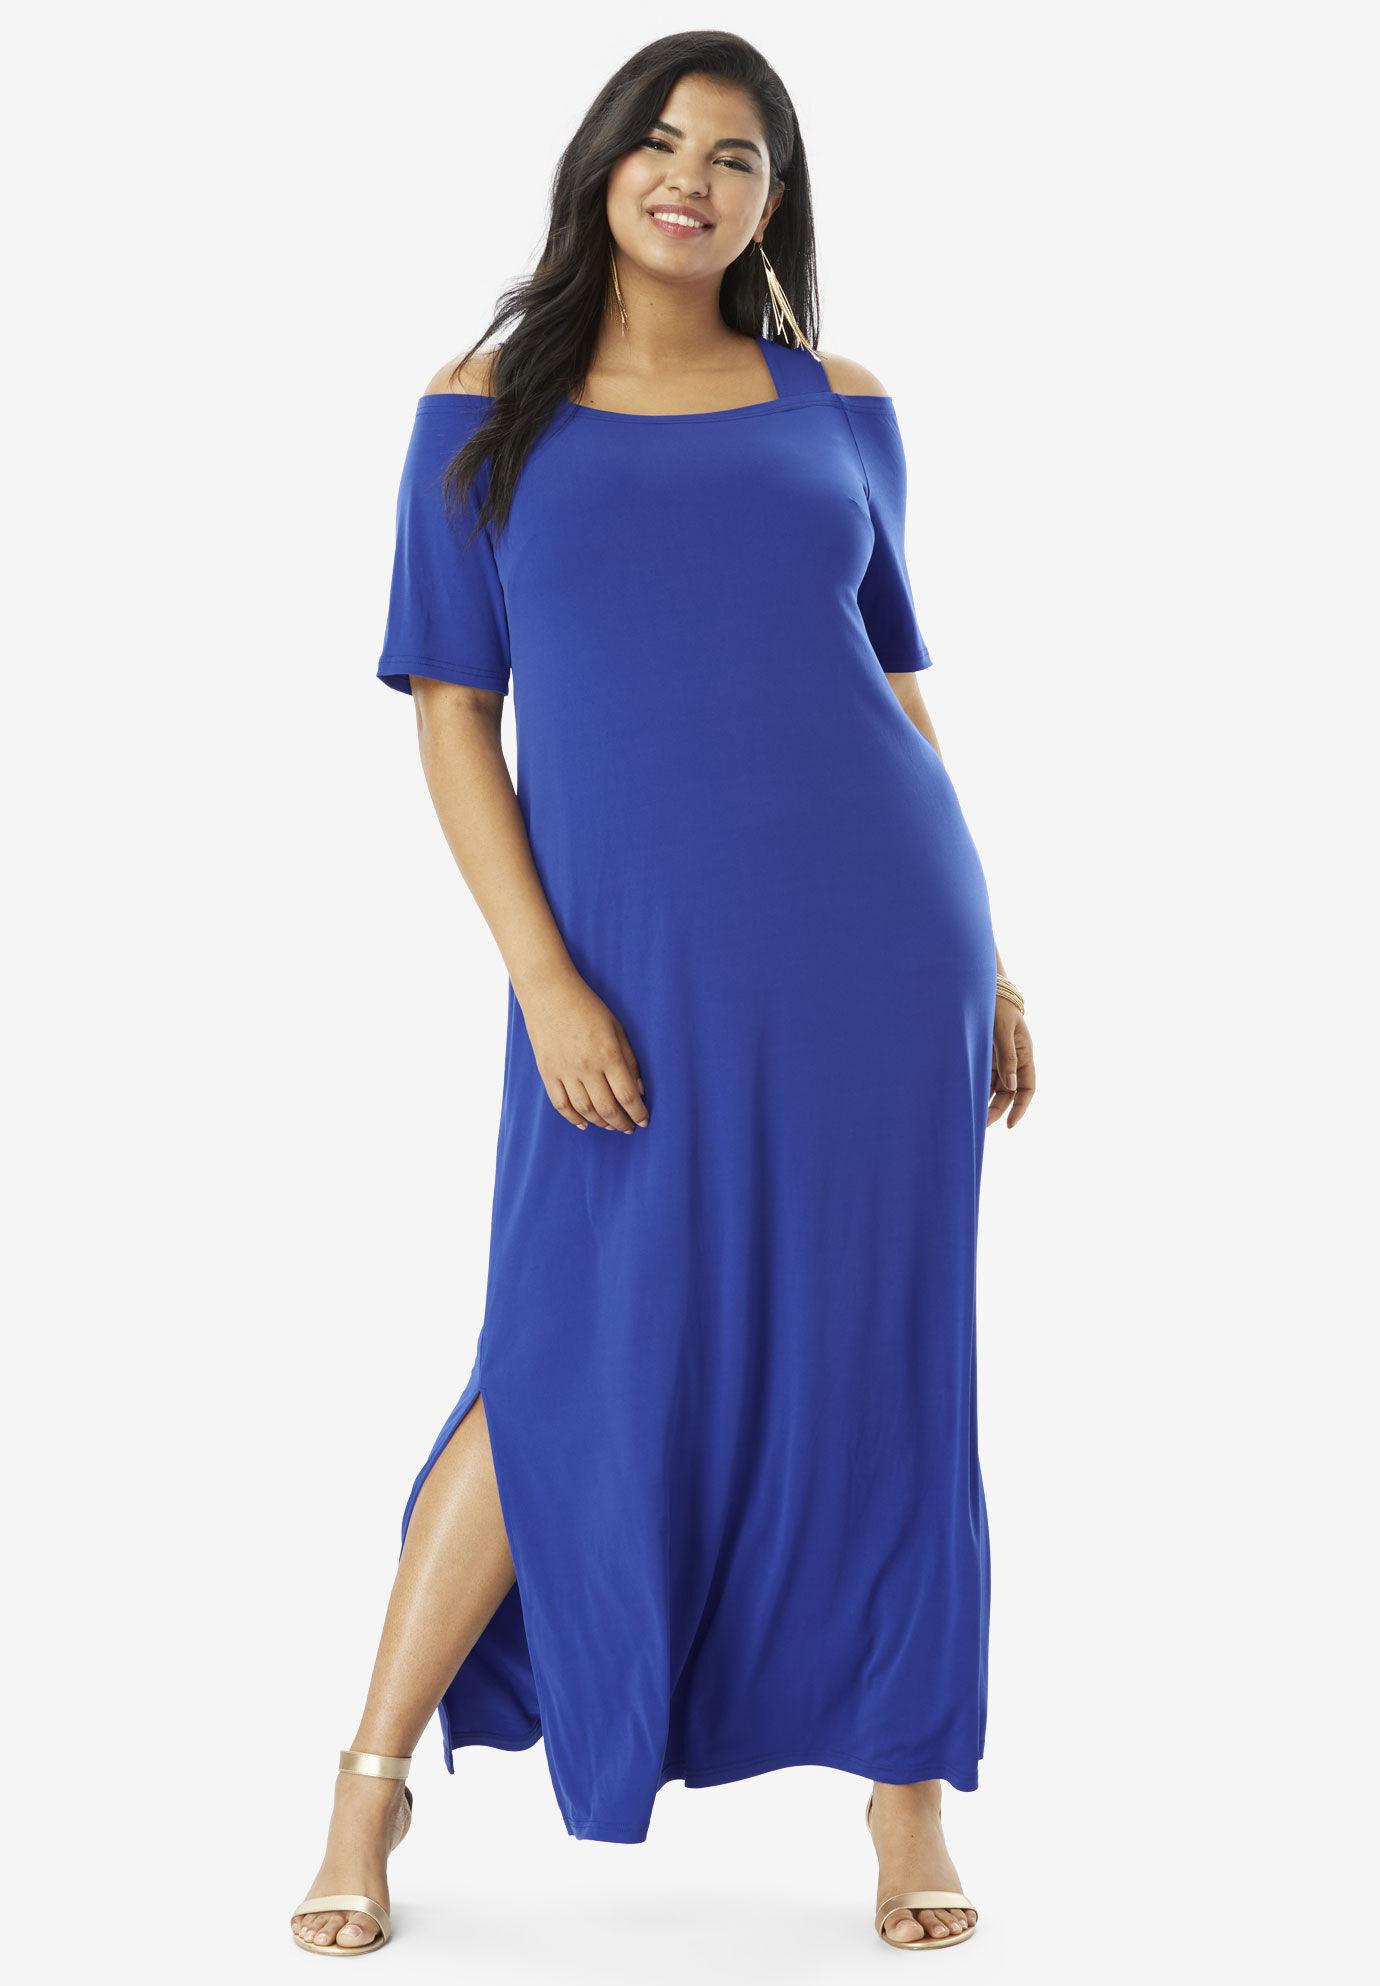 Roamans Plus Size Mother of Groom Dresses